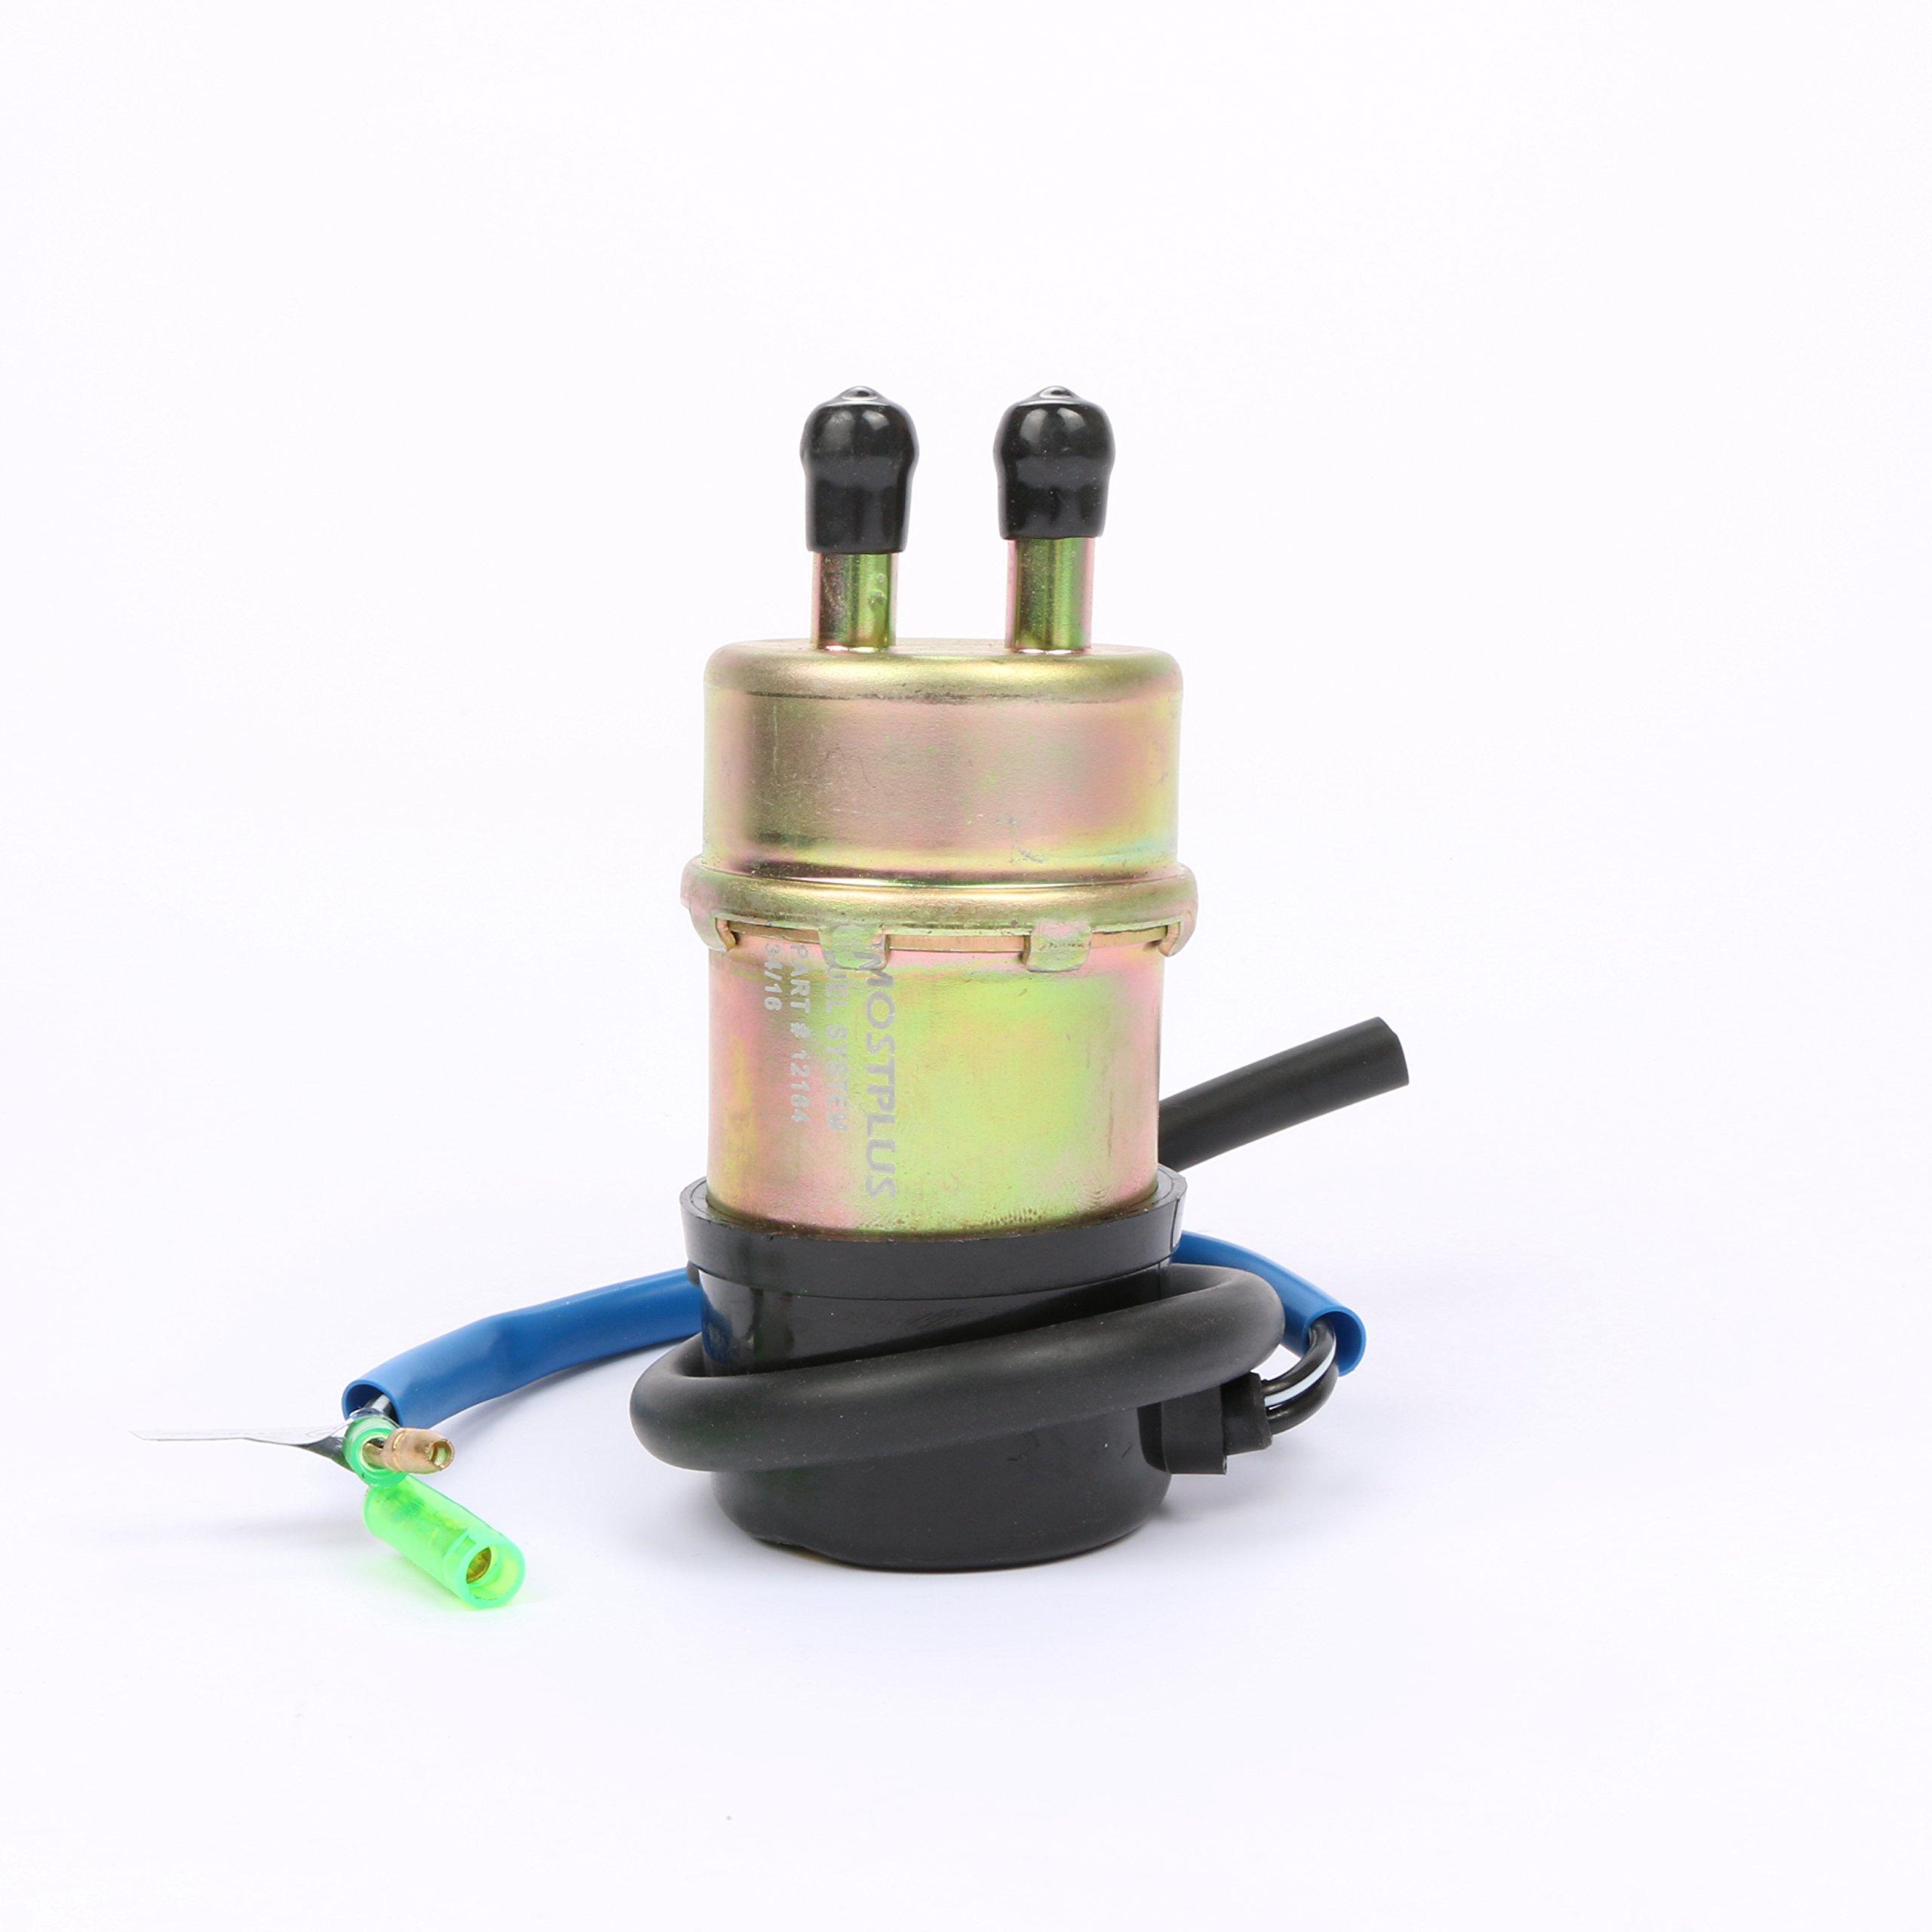 Mostplus Fuel Pump For Kawasaki Mule 3000 3010 3020 2500 2510 2520 Filter 1000 12184 Electric Pumps Automotive Tibs